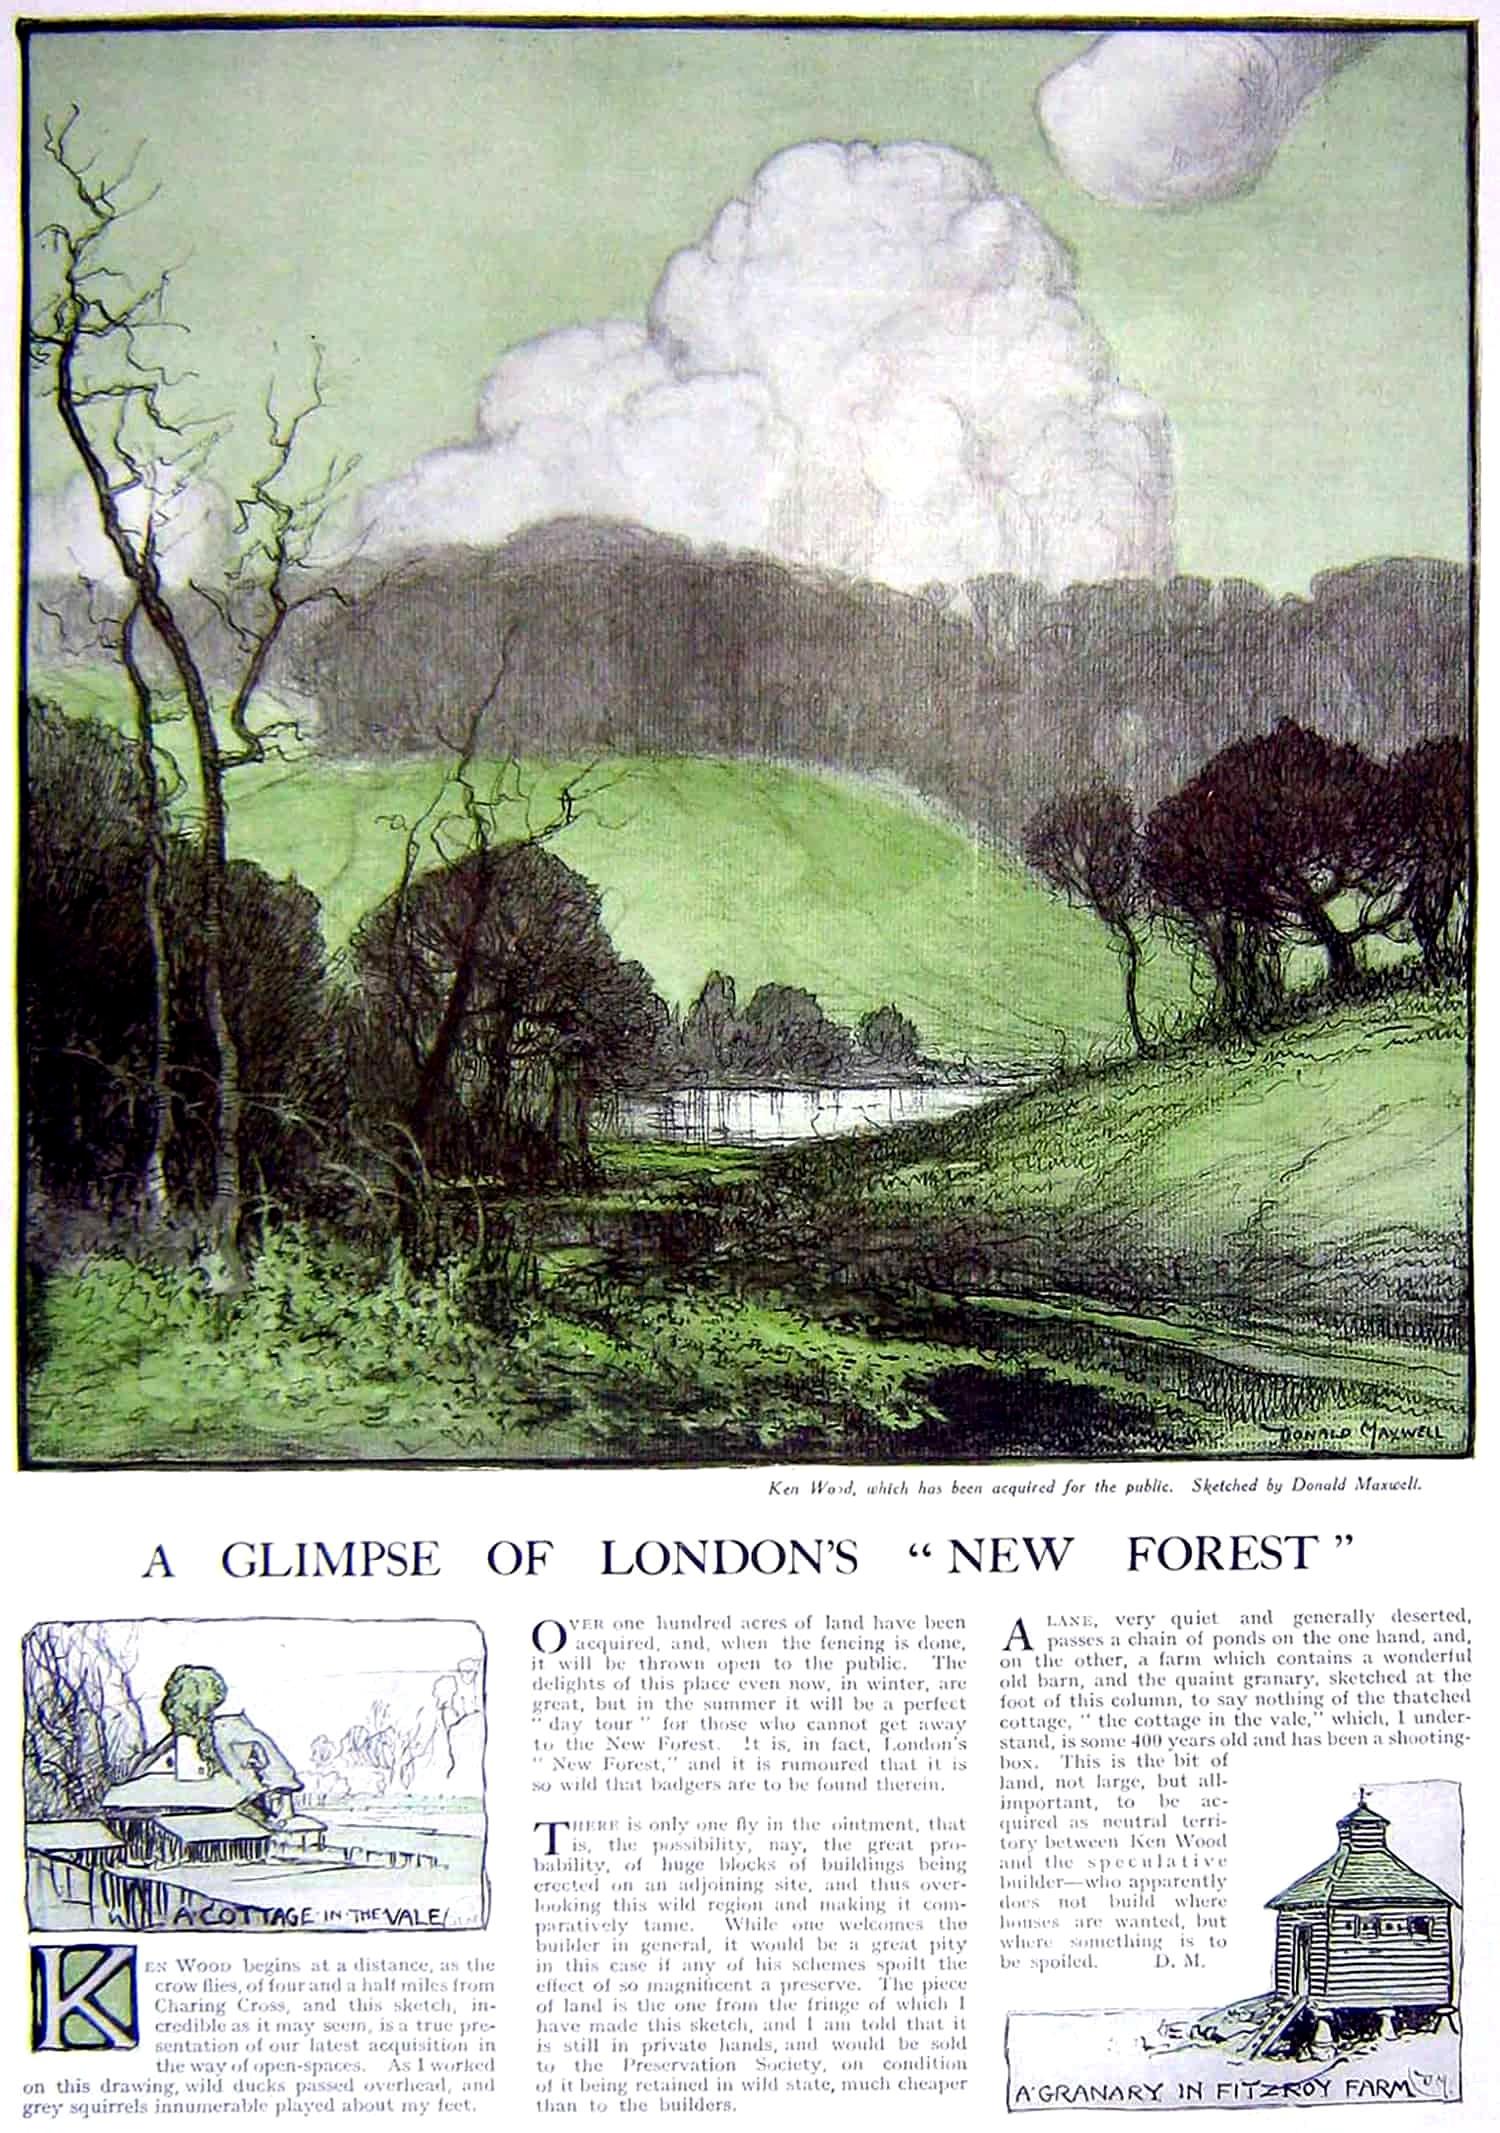 1925+Ken+Wood+Granary+Fitzroy+Farm+Cottage.jpg